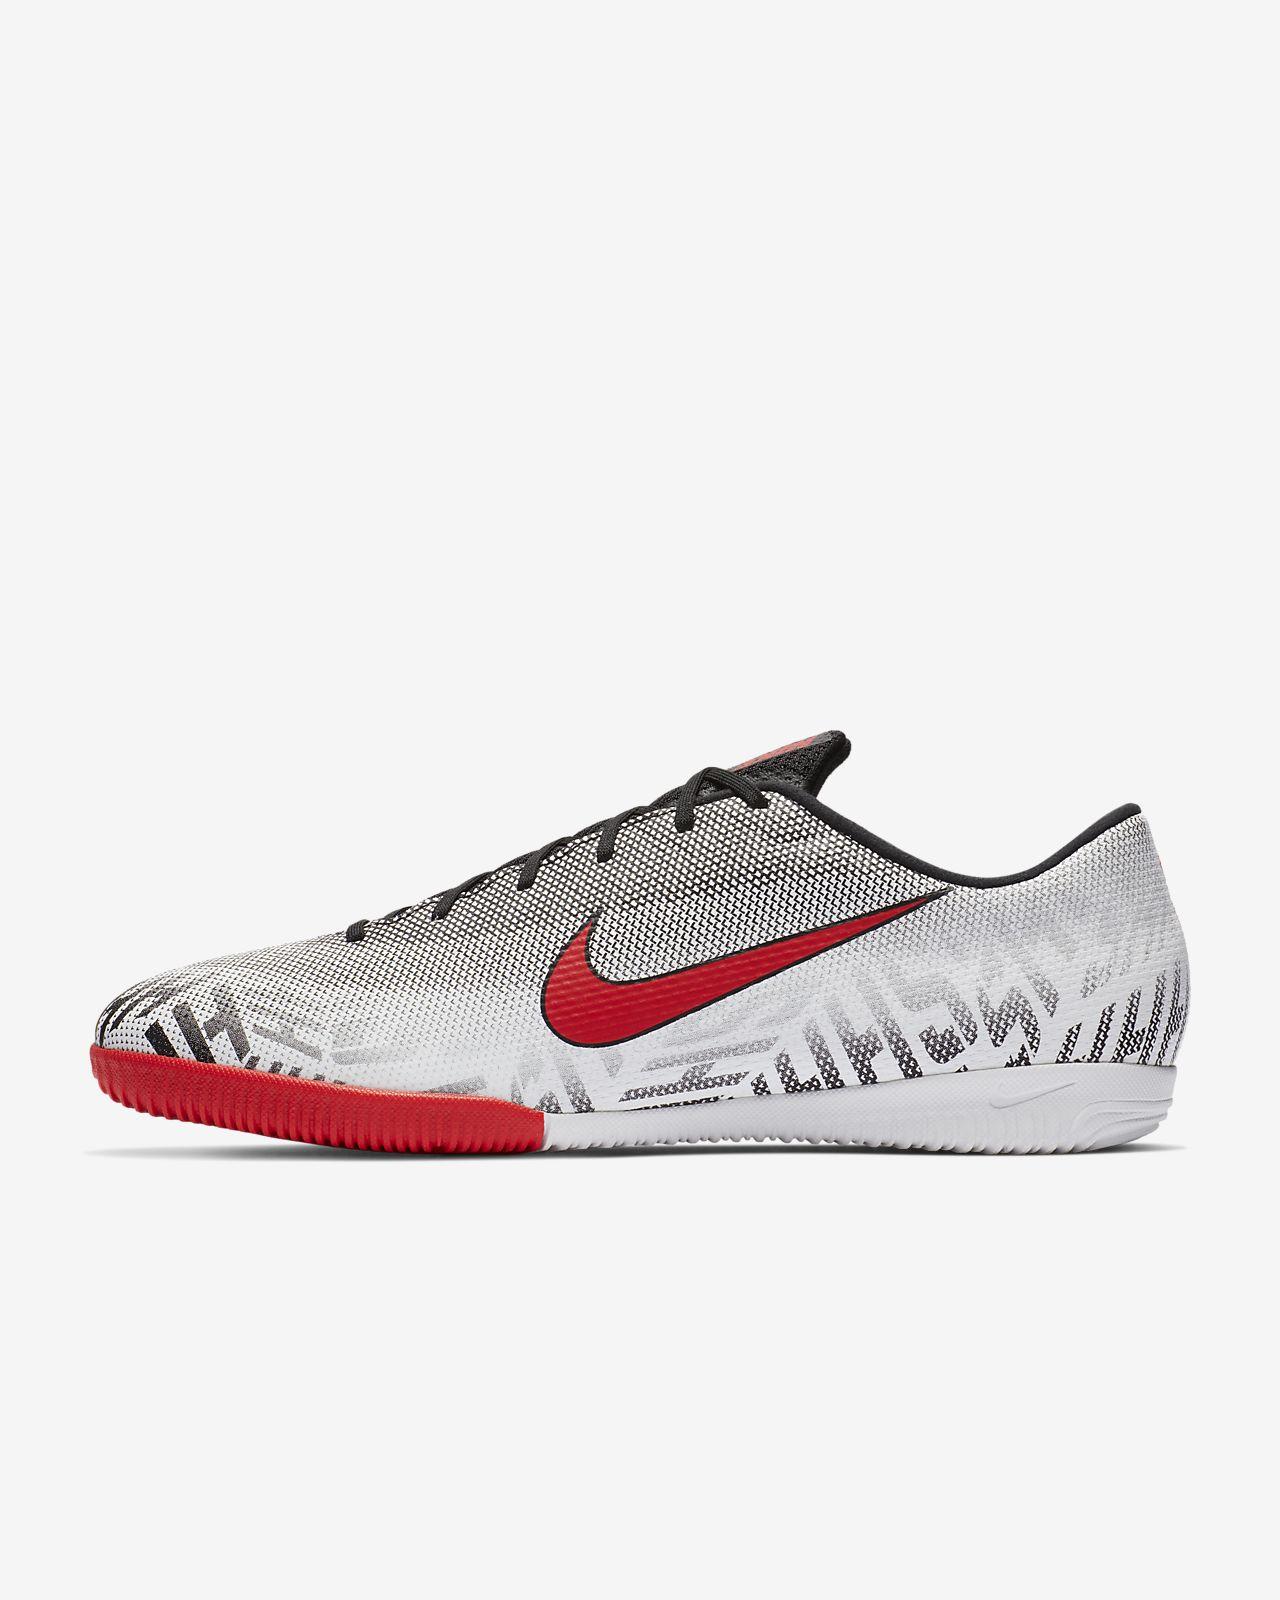 6db4f5644ce00 Sapatilhas de futsal Nike Mercurial Vapor XII Academy Neymar Jr ...